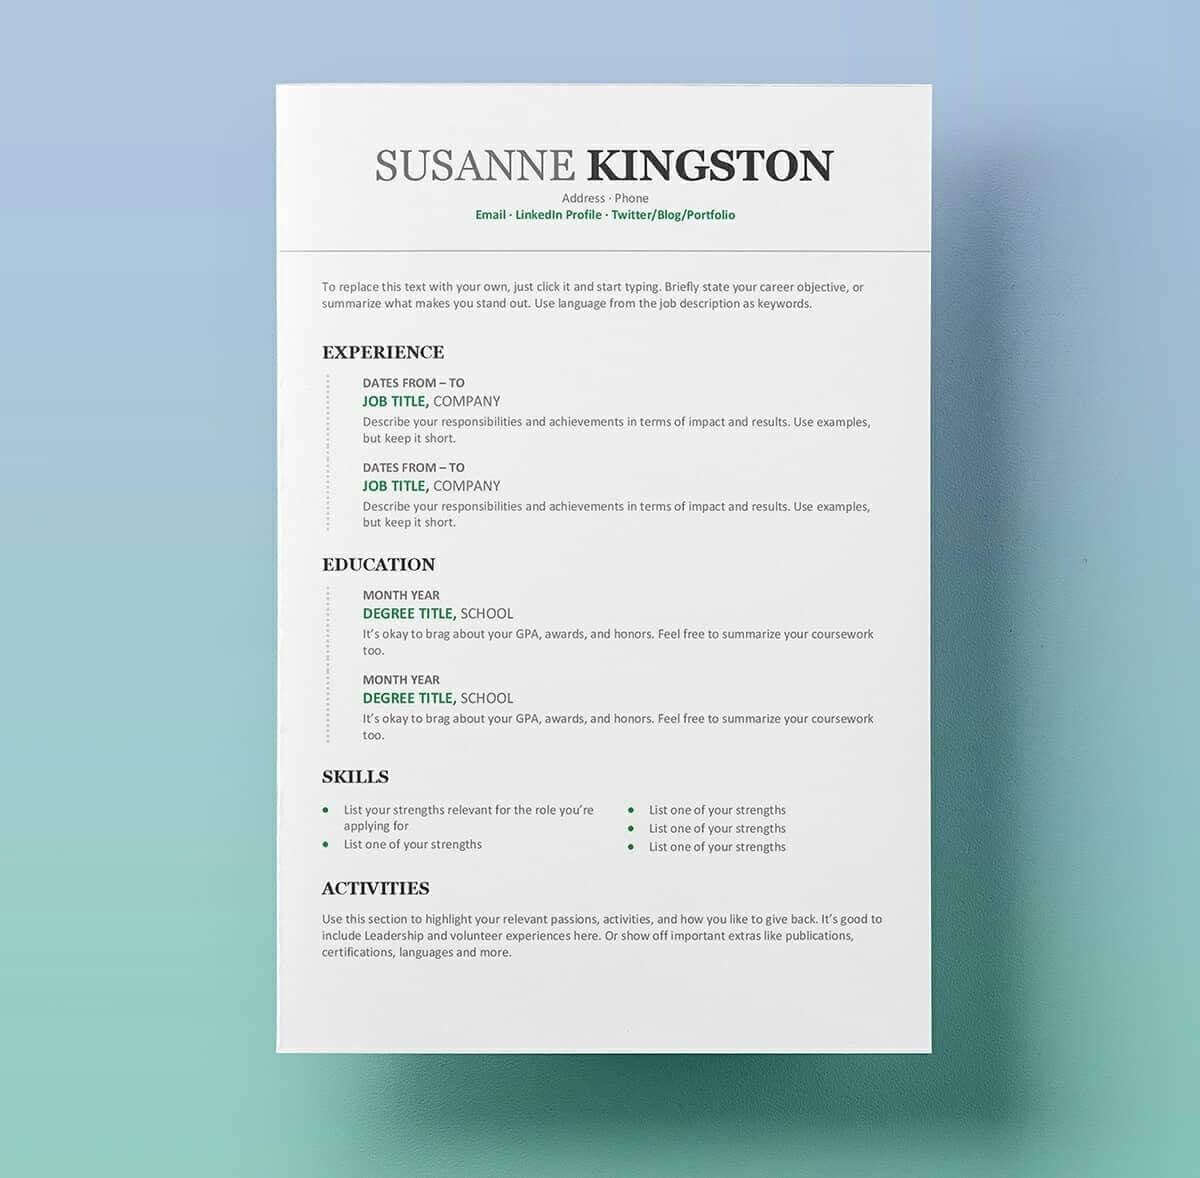 11 Free Professional Resume Templates Microsoft Word Format Intended For Free Resume Template Microsoft Word